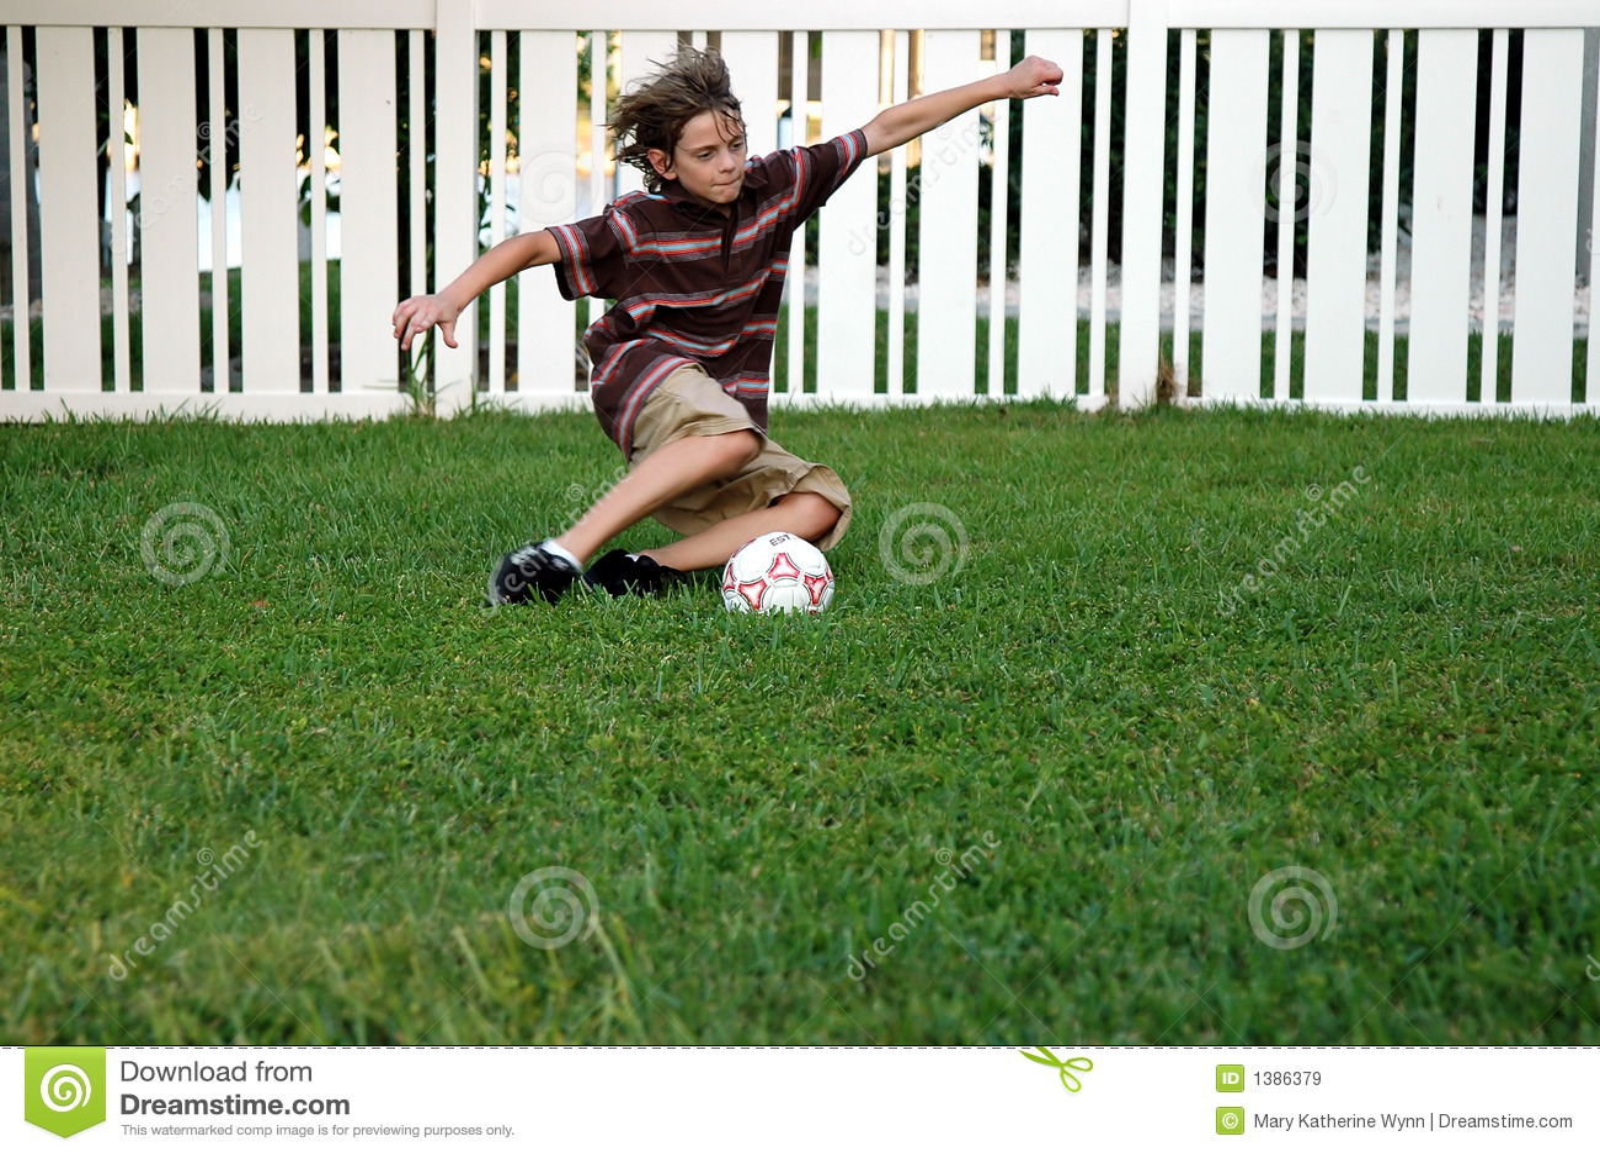 boy playing soccer in the backyard